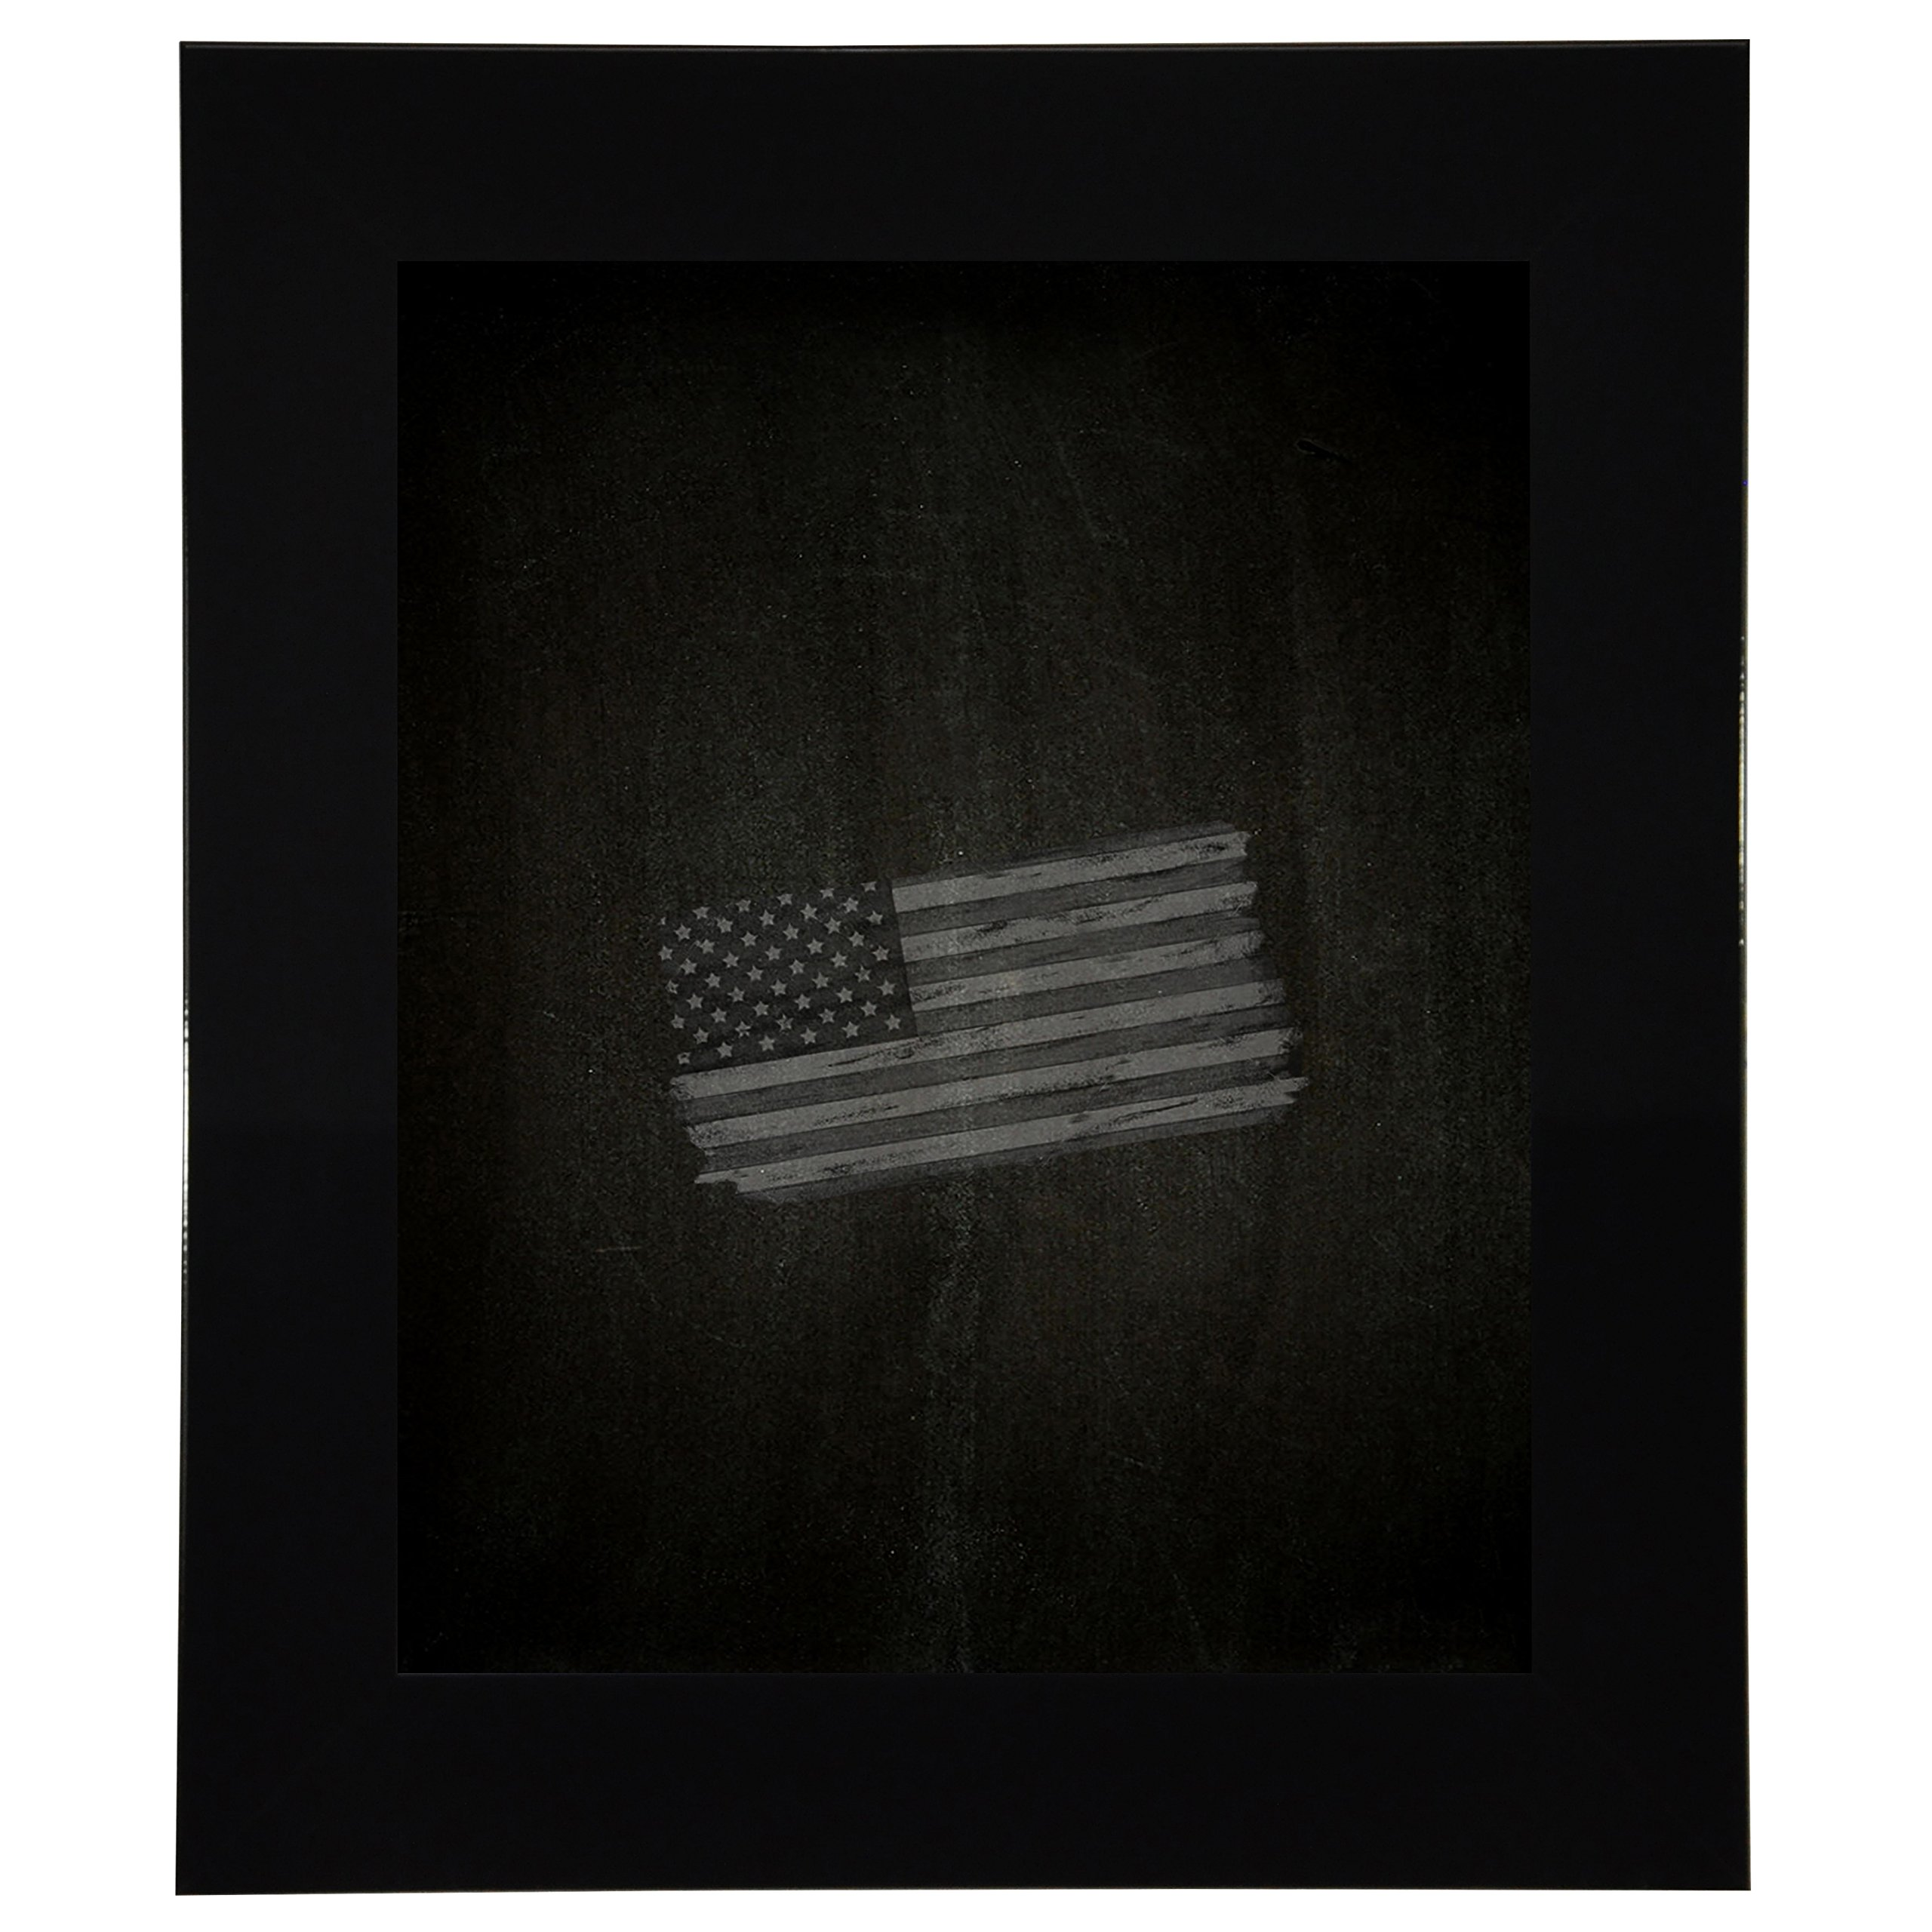 Rayne Mirrors American Made Rayne Delta Black Blackboard/ Chalkboard Exterior Size: 24 x 42 by Rayne Mirrors